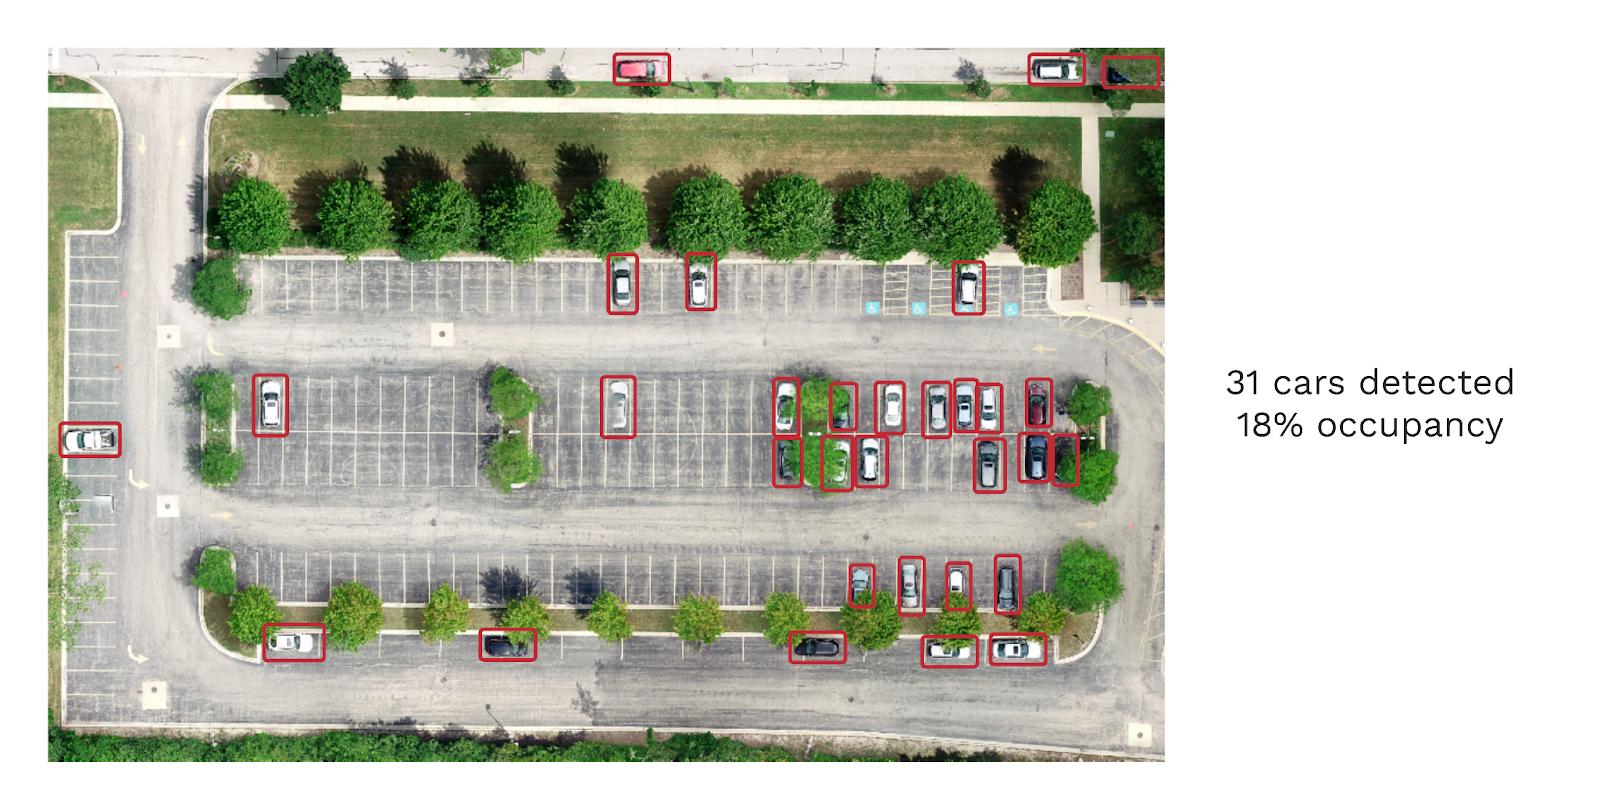 31 cars detected